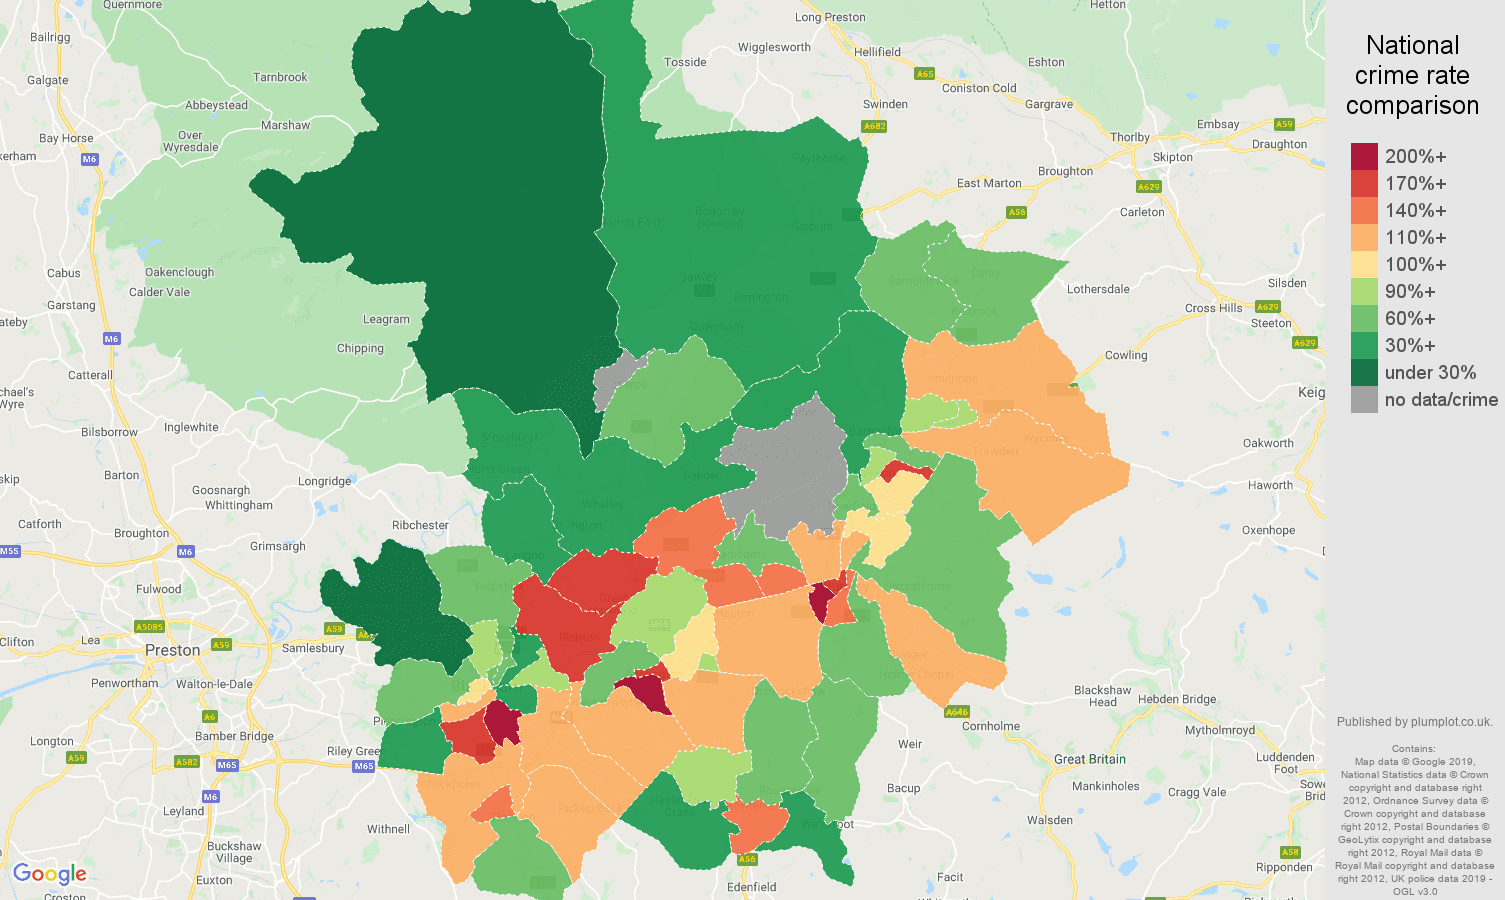 Blackburn other crime rate comparison map